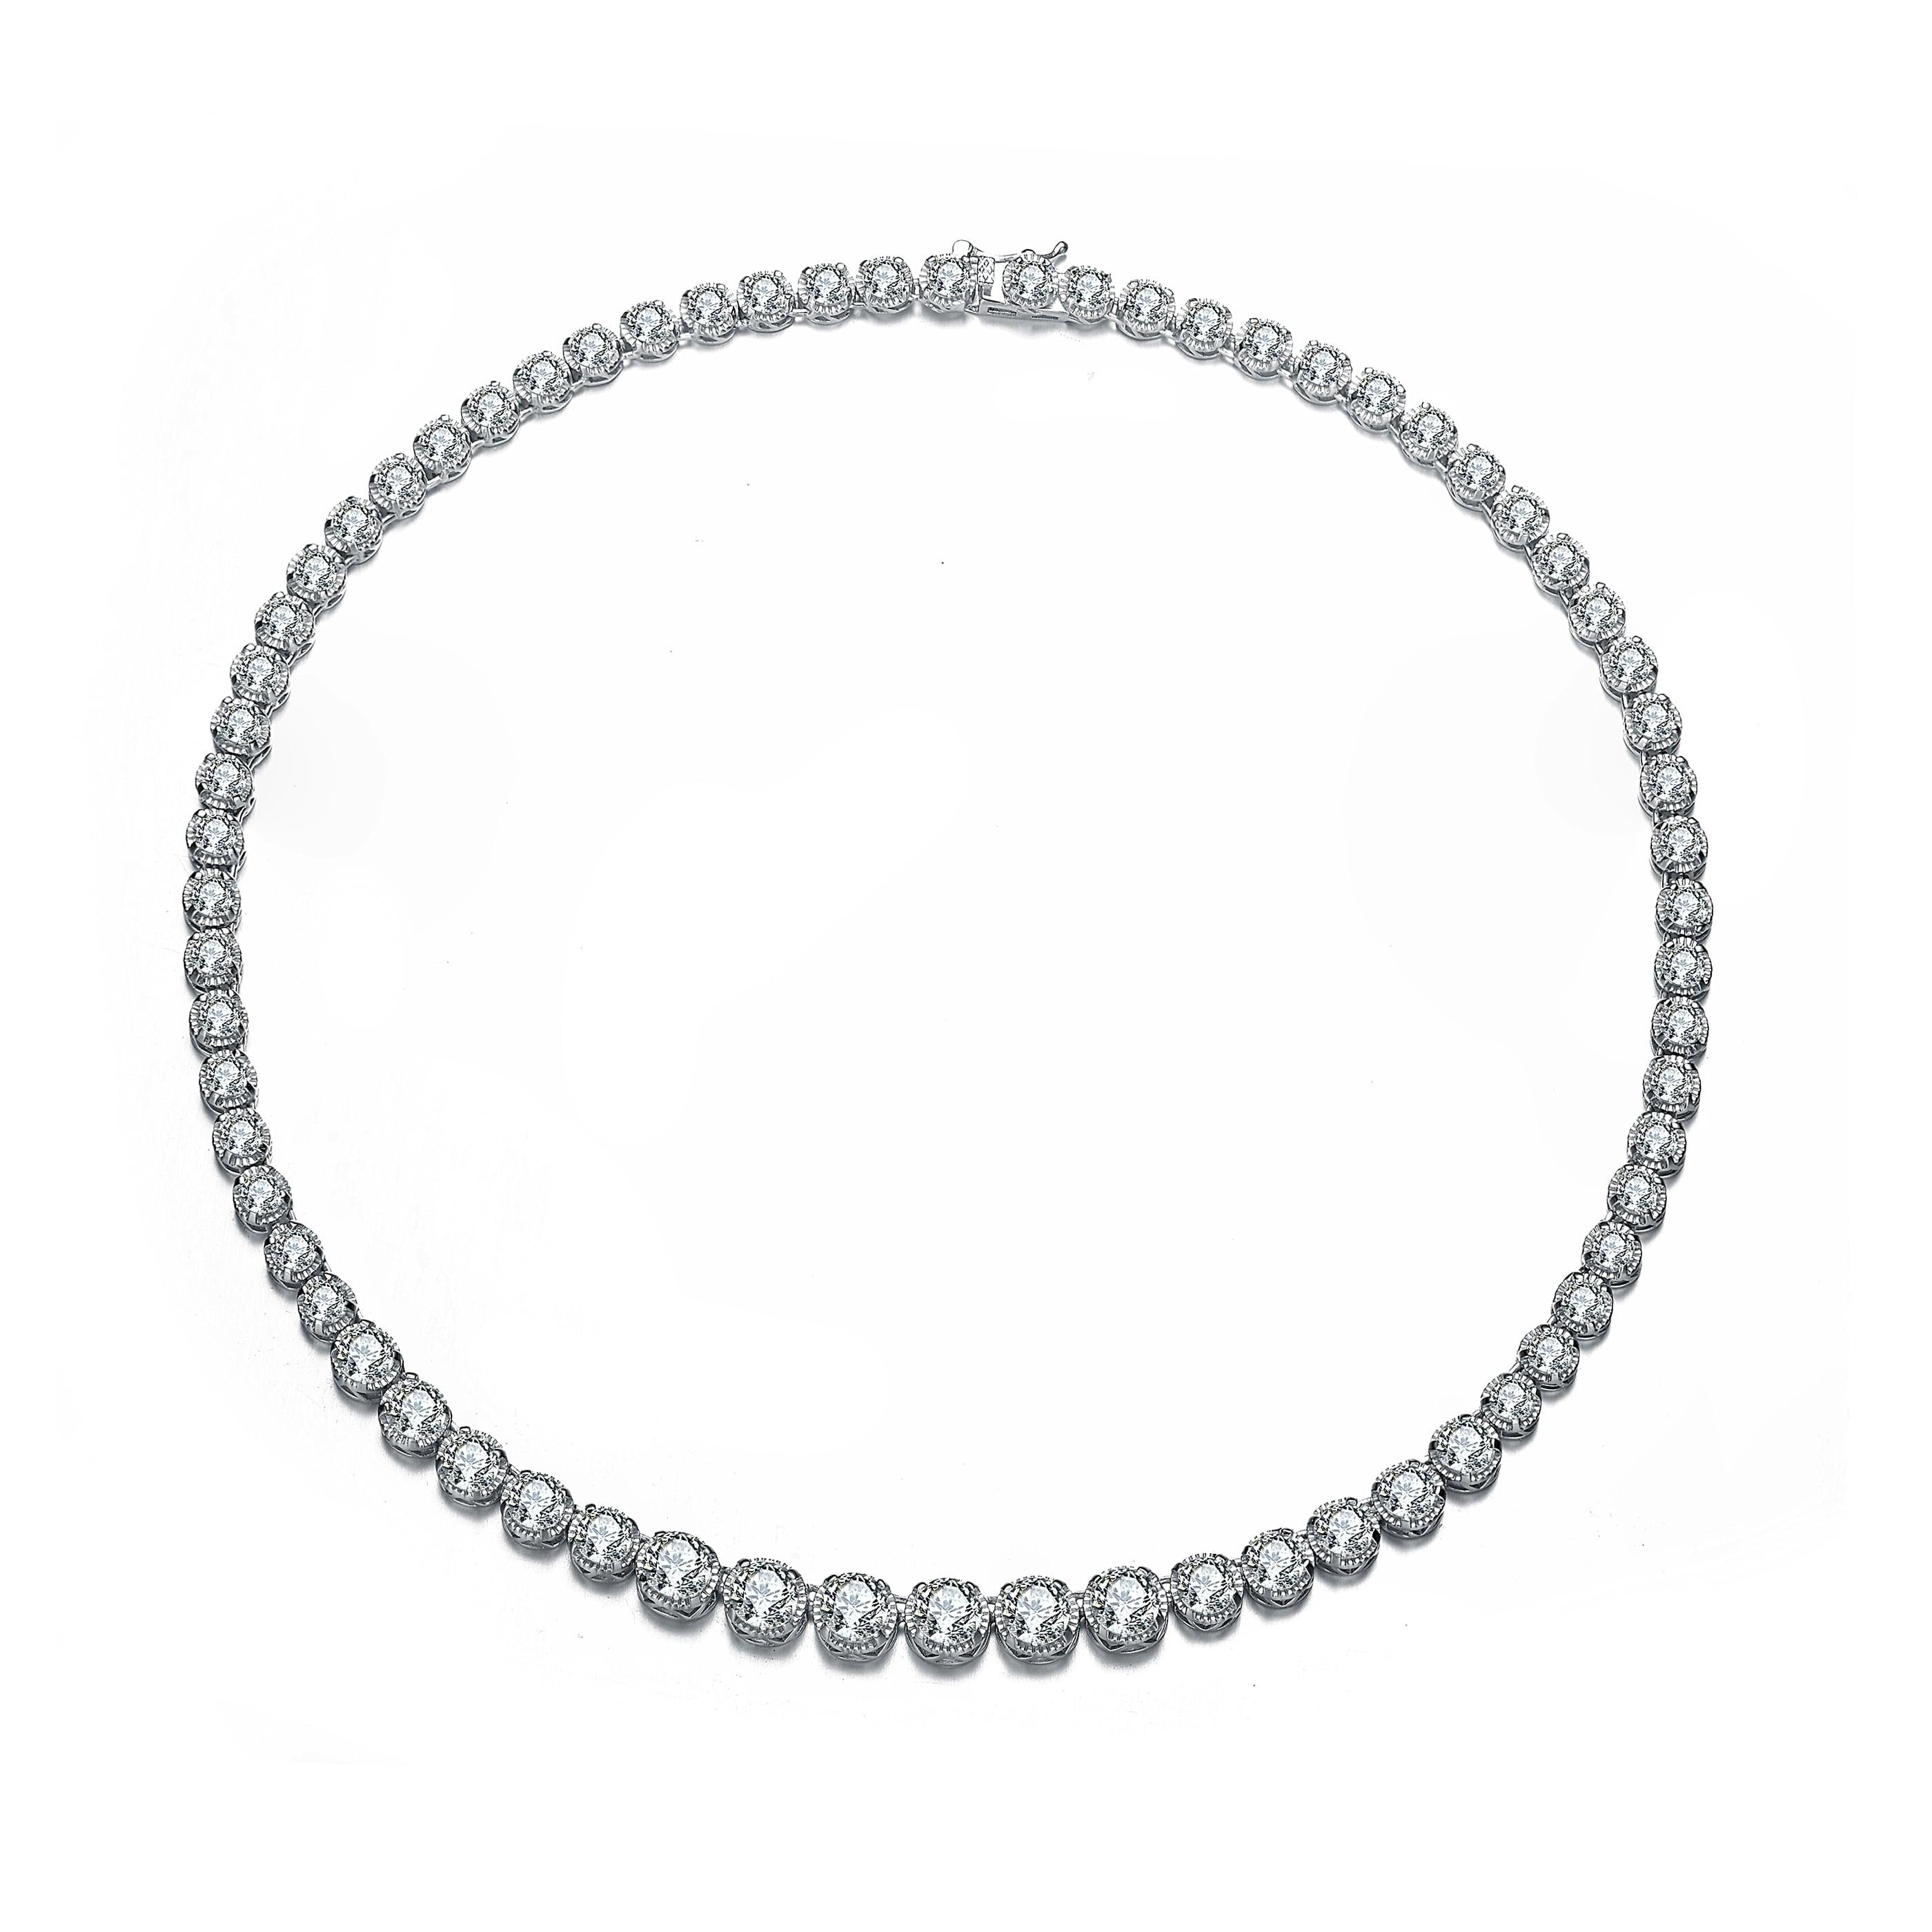 Rhodium Finished Stunning CZ Tennis Bracelet or Necklace Choose Length